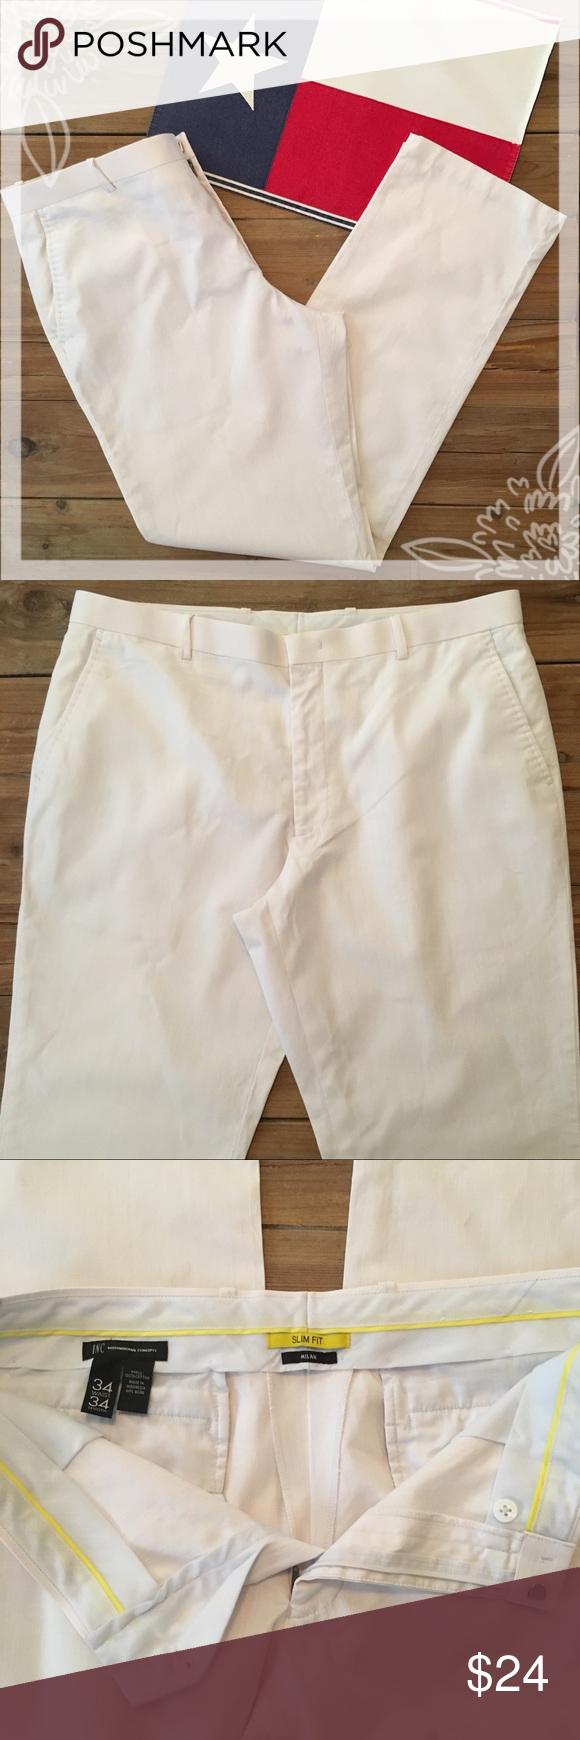 INC (International Concepts) White Slacks INC (International Concepts) White Slacks. Size 34/34. Milan Slim Fit. 4-pocket slacks (back pockets have hidden buttonholes). Front zipper/button/hook & eye closure. Excellent used condition.  INC (International Concepts) White Slacks INC (International Concepts) White Slacks. Size 34/34. Milan Slim Fit. 4-pocket slacks (back pockets have hidden buttonholes). Front zipper/button/hook & eye closure. Excellent used condition. #whiteslacks